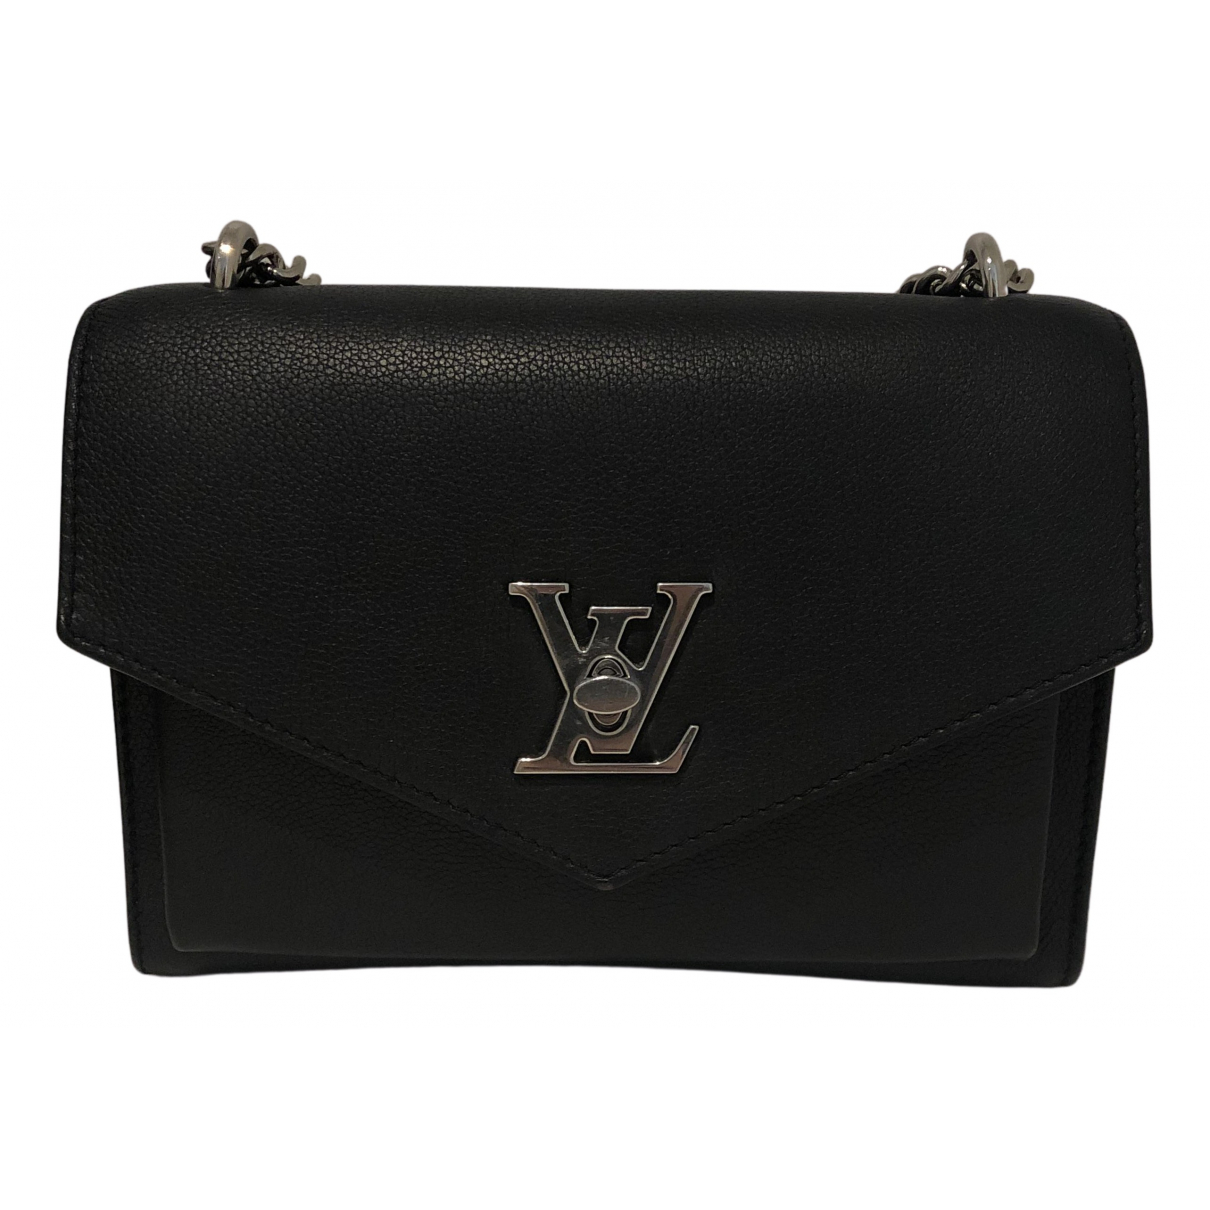 Louis Vuitton Mylockme Black Leather handbag for Women N